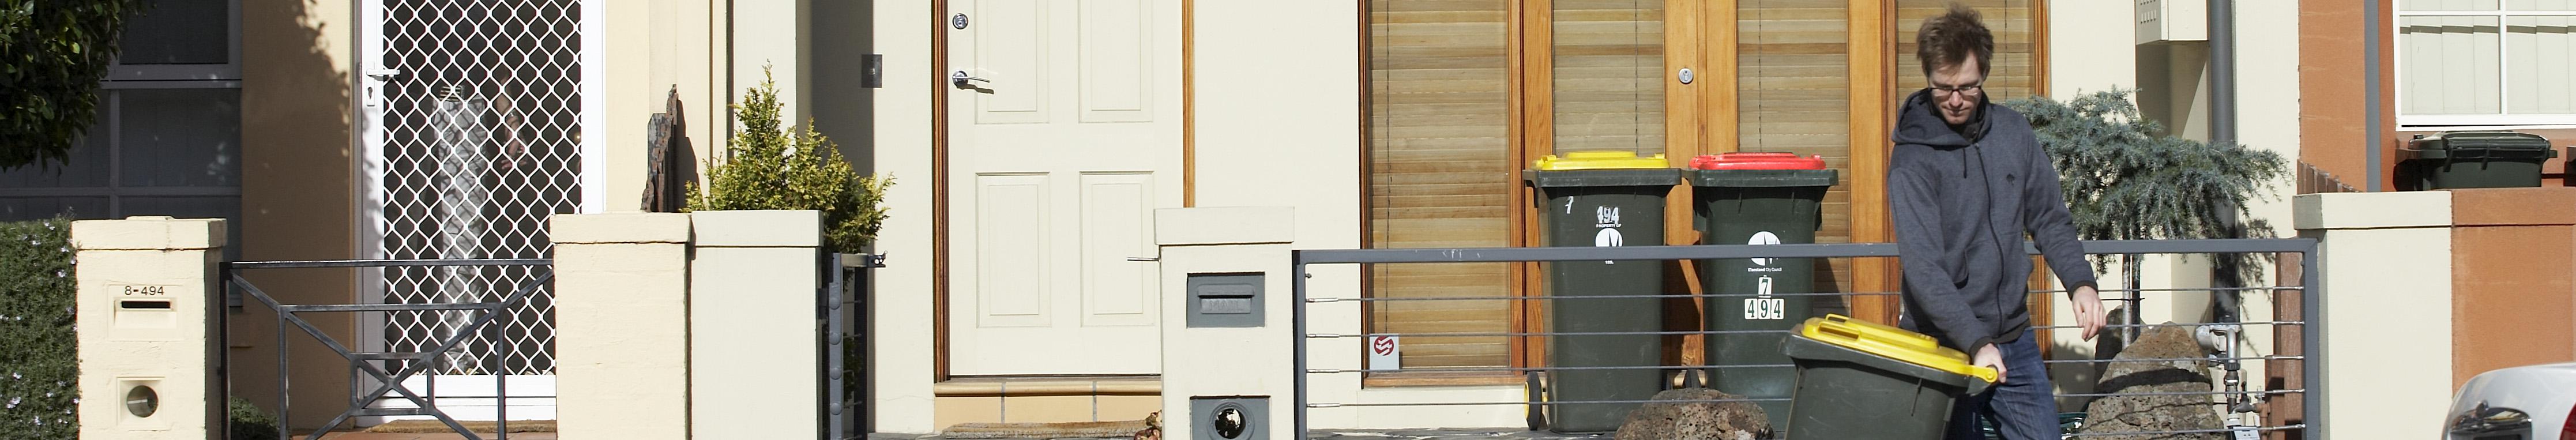 Househould kerbside collection bins